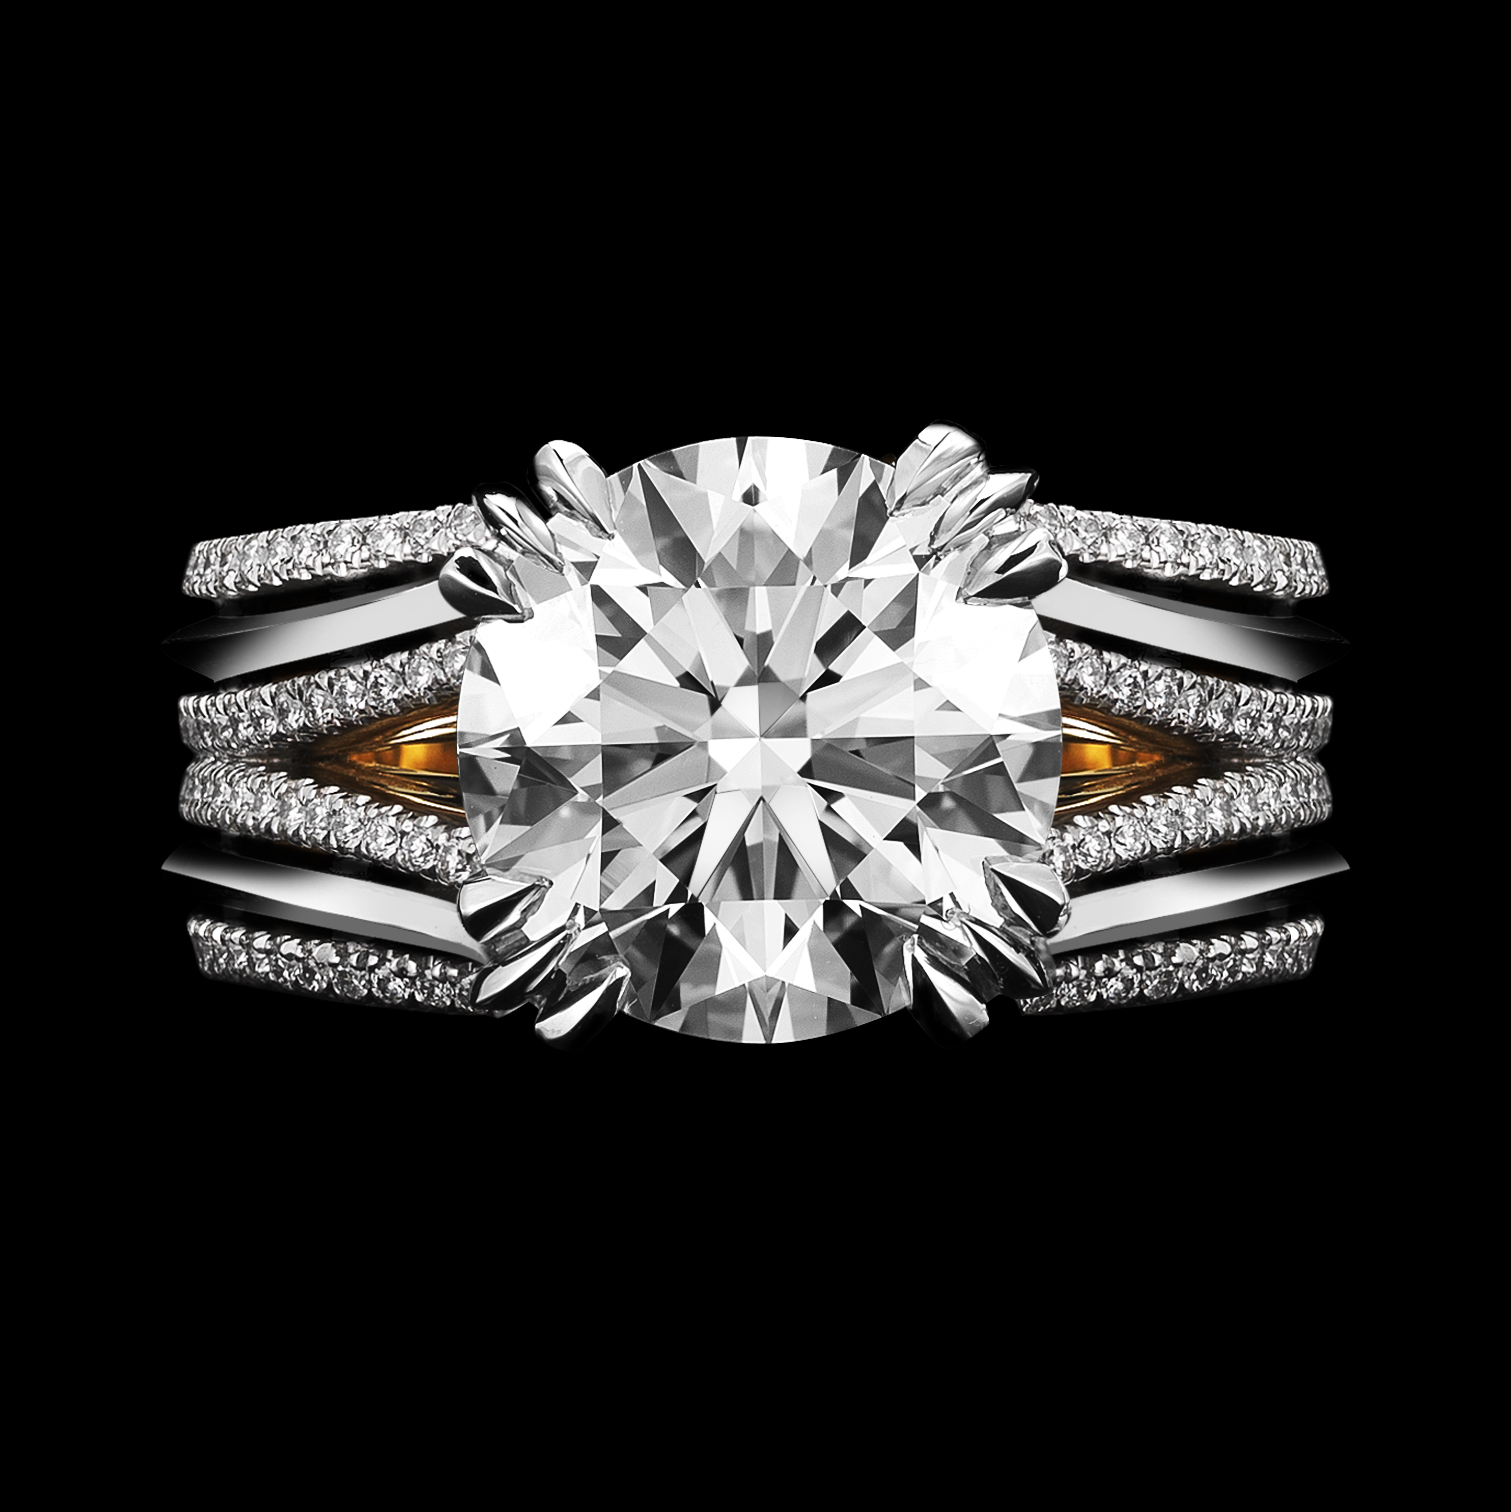 Double shank floating brilliant-cut diamond ring.